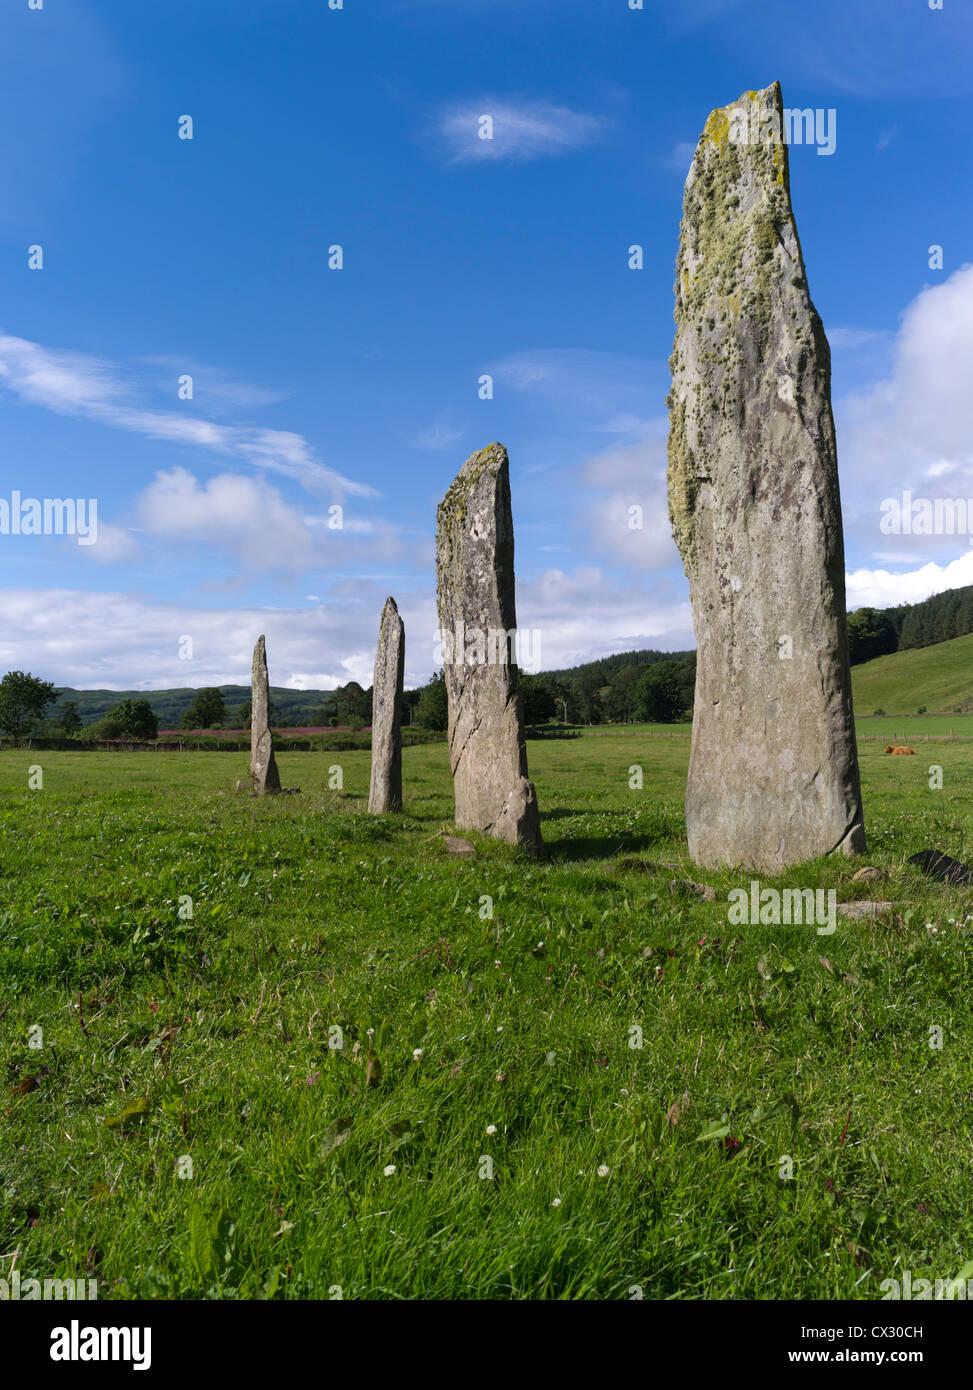 dh Kilmartin Glen KILMARTIN ARGYLL Ballymeanoch standing stones scottish prehistory neolithic stone age - Stock Image